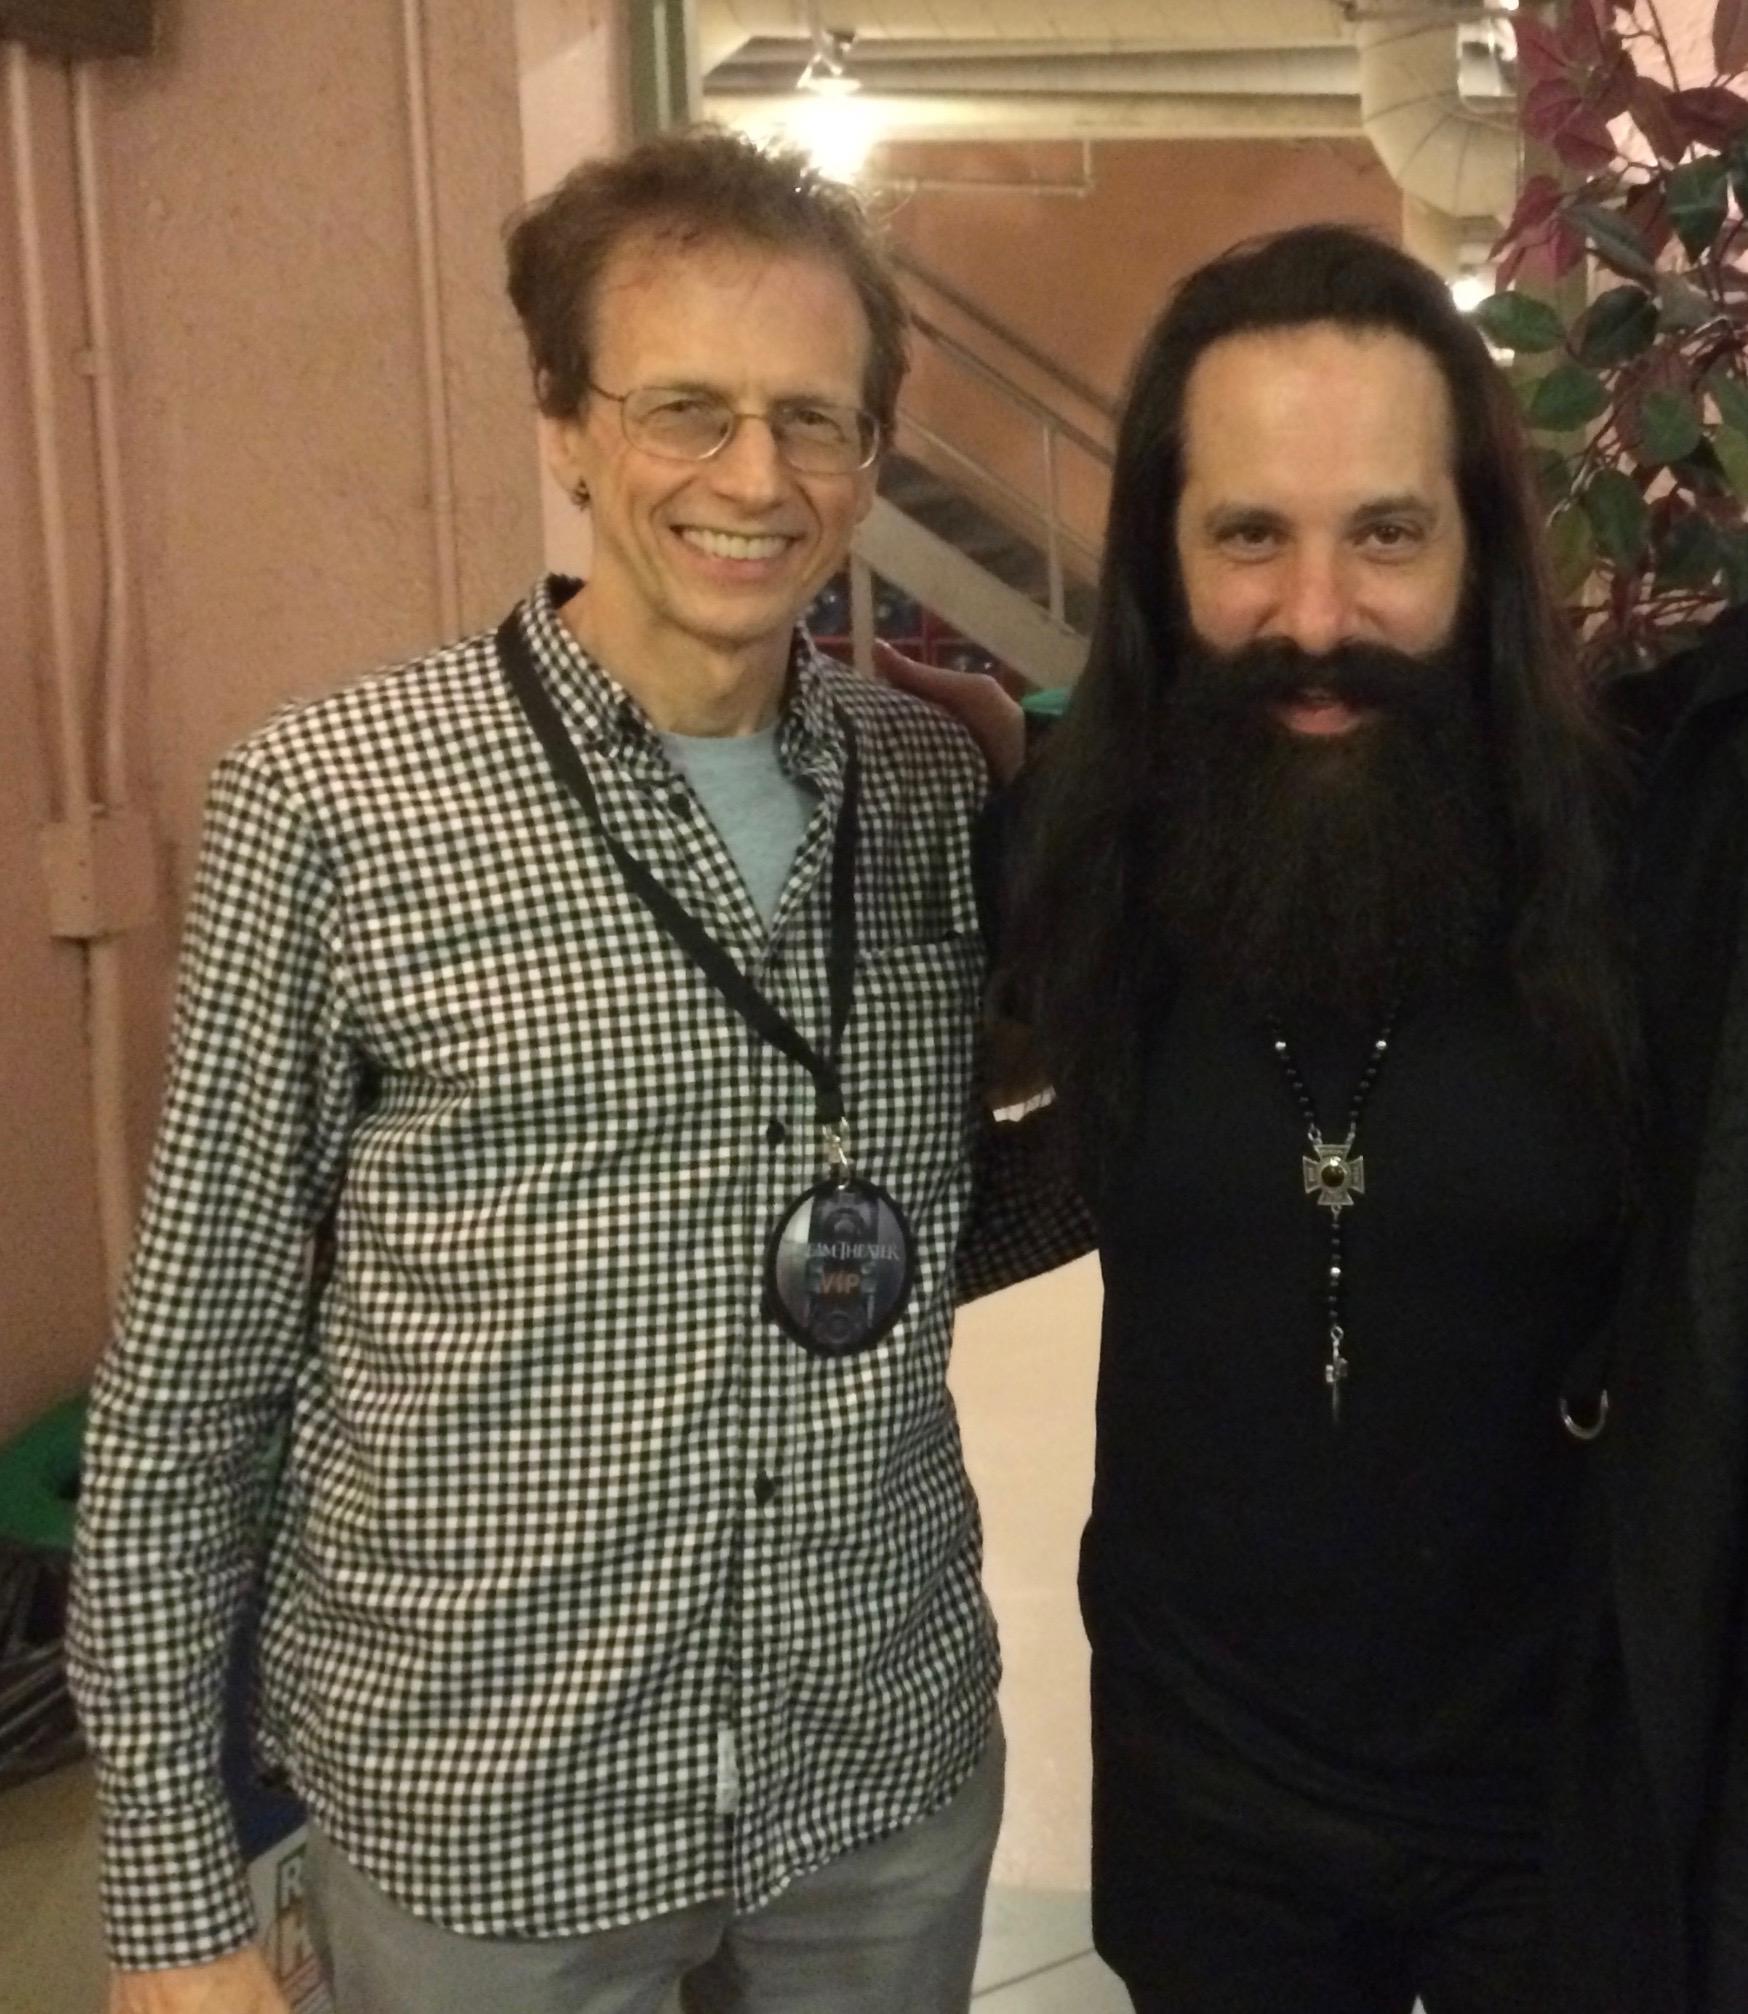 David Campbell with John Petrucci